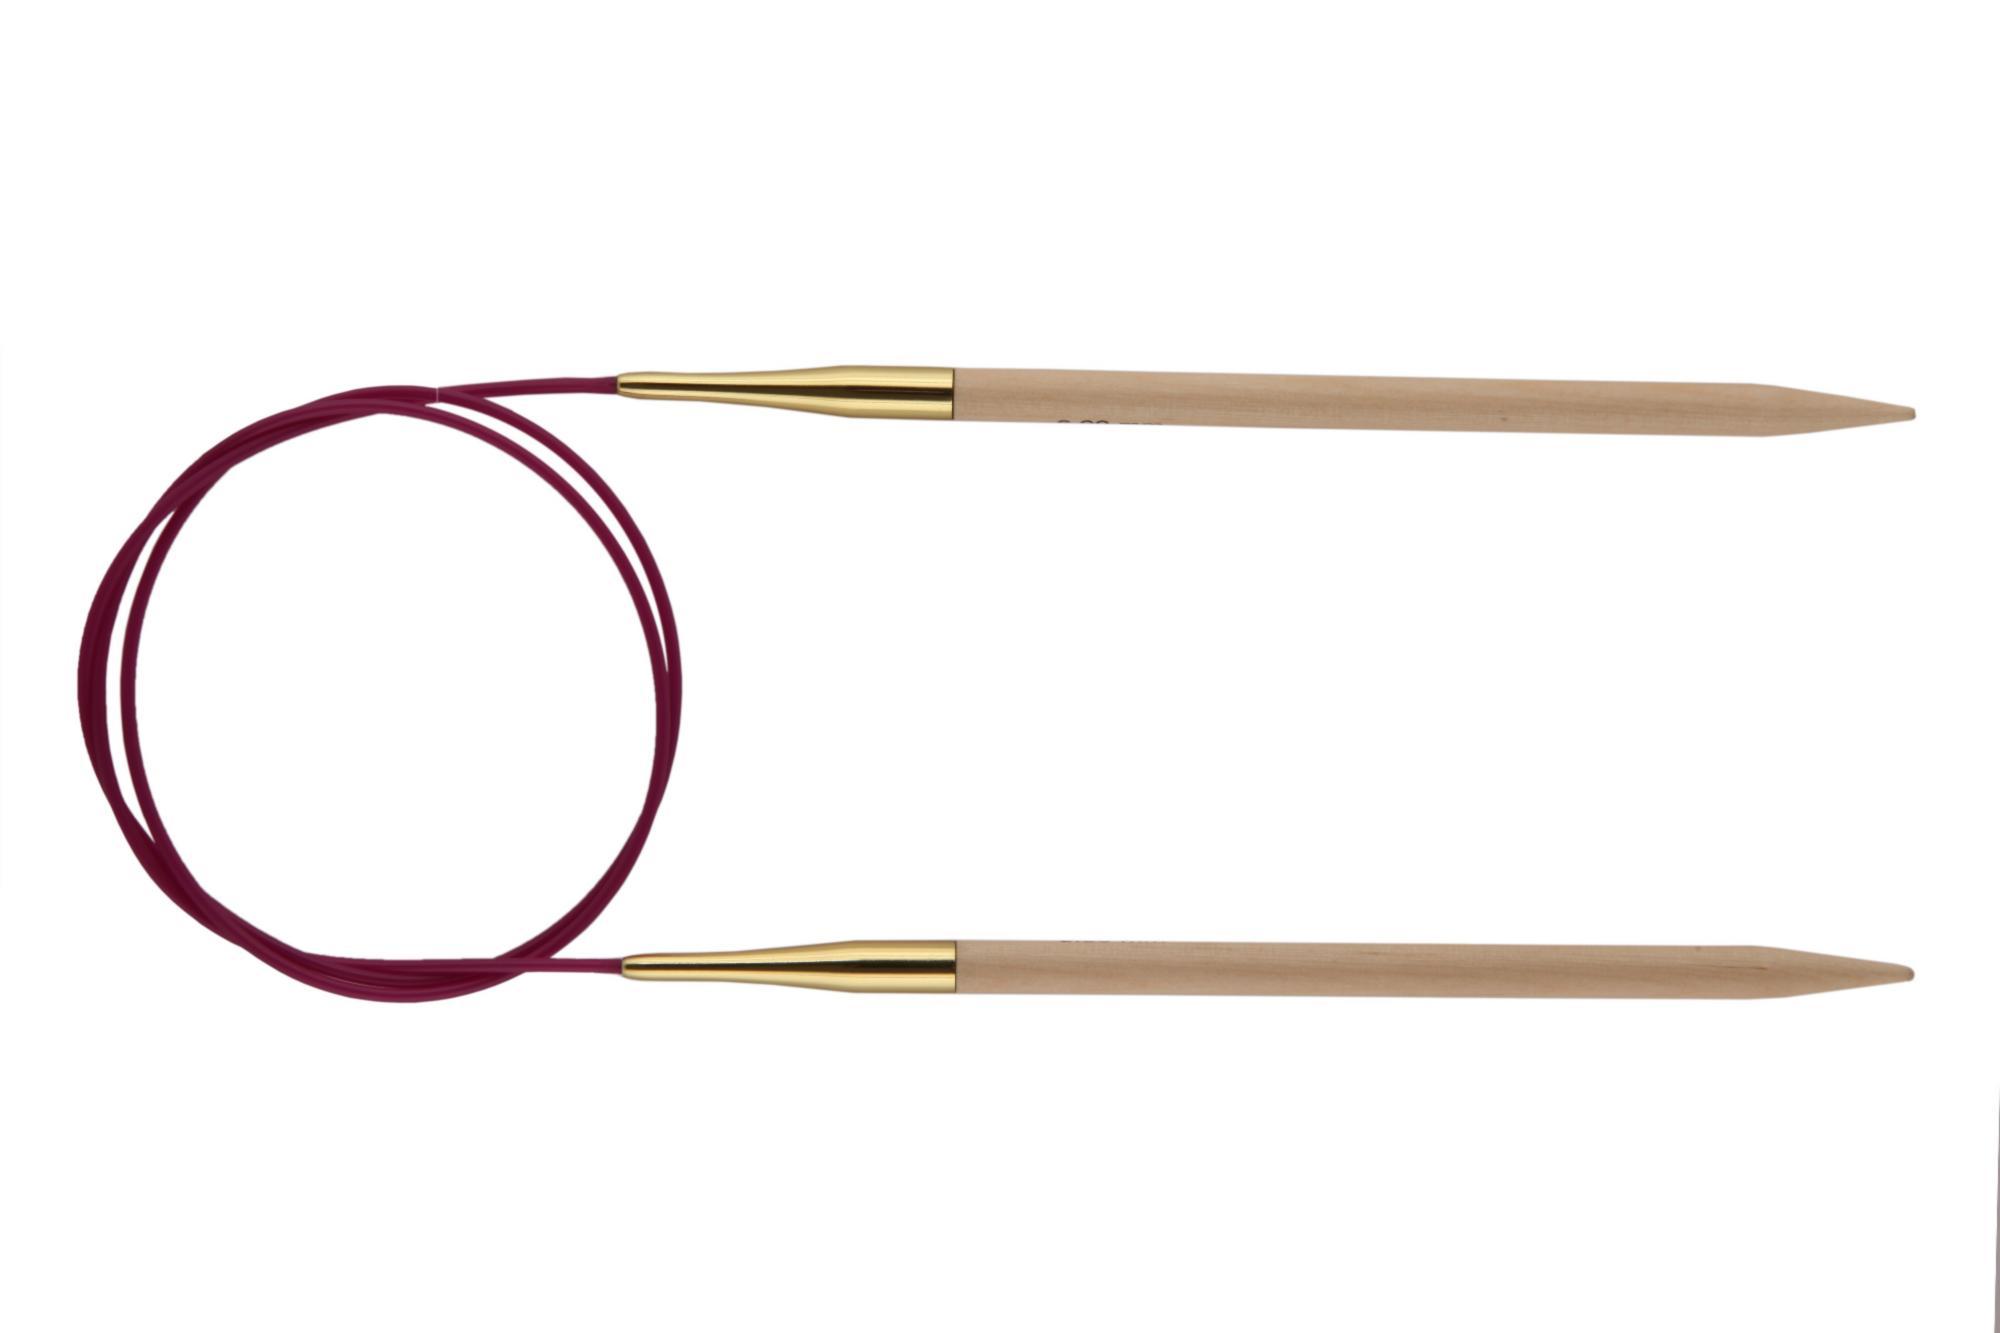 Спицы круговые 100 см Basix Birch Wood KnitPro, 35341, 5.50 мм